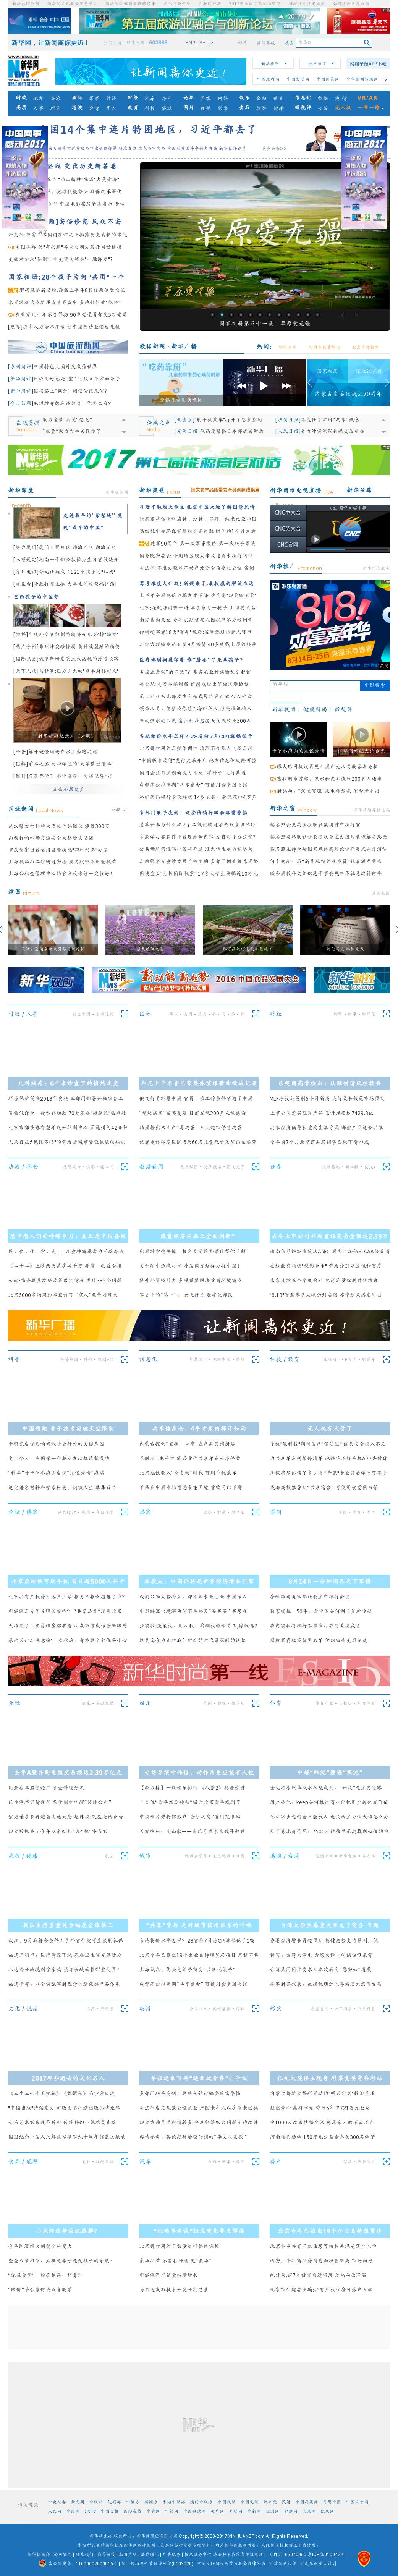 Xinhua at Wednesday Aug. 16, 2017, 1:21 a.m. UTC